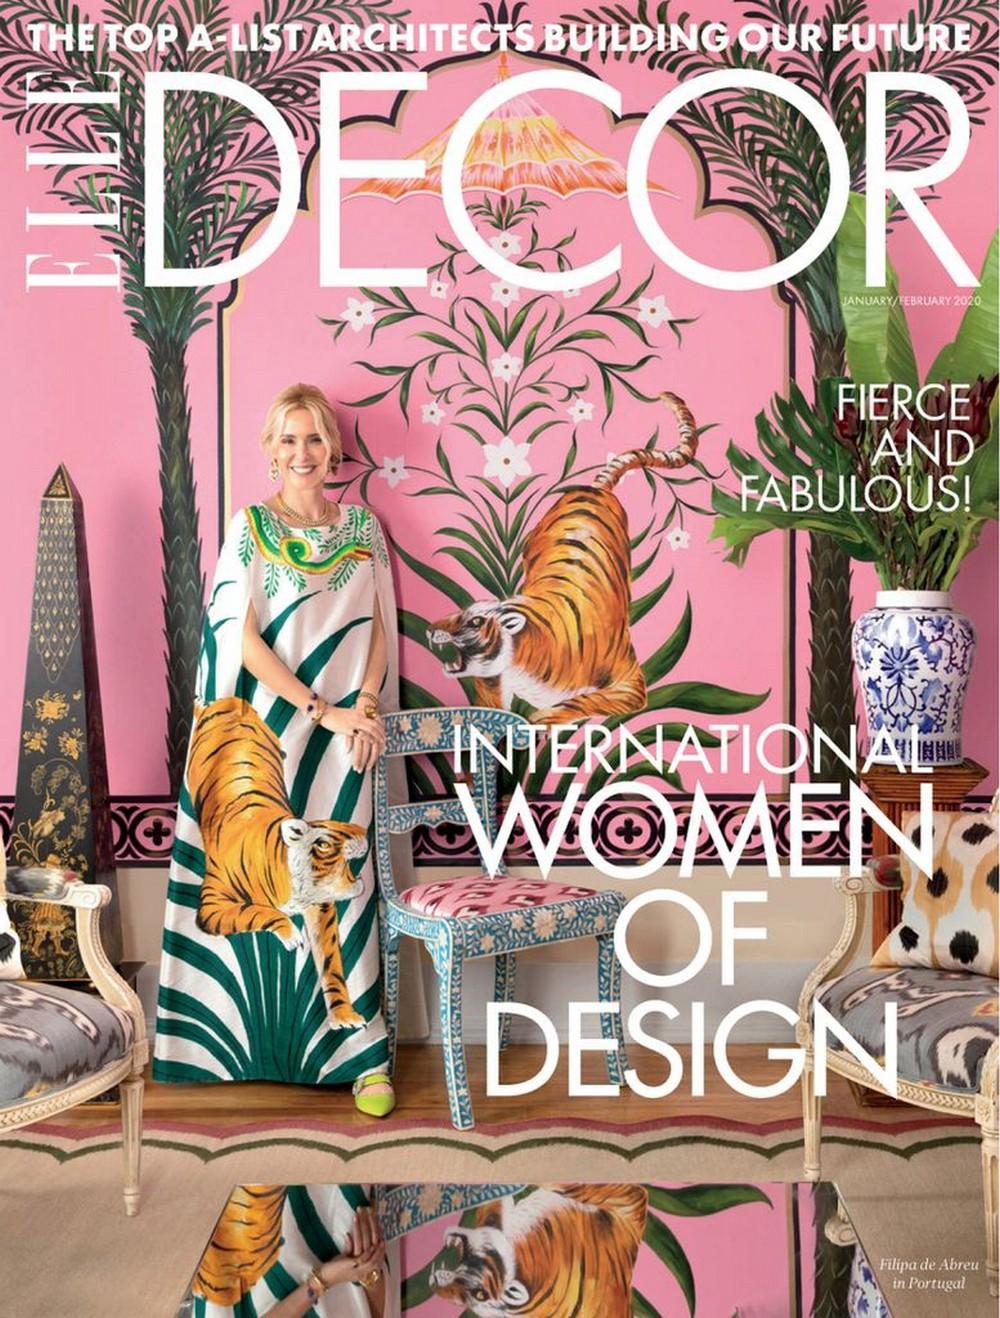 5 Interior Design Magazines You Must Read This Month! interior design 5 Interior Design Magazines You Must Read This Month! 5 Interior Design Magazines You Must Read This Month 3